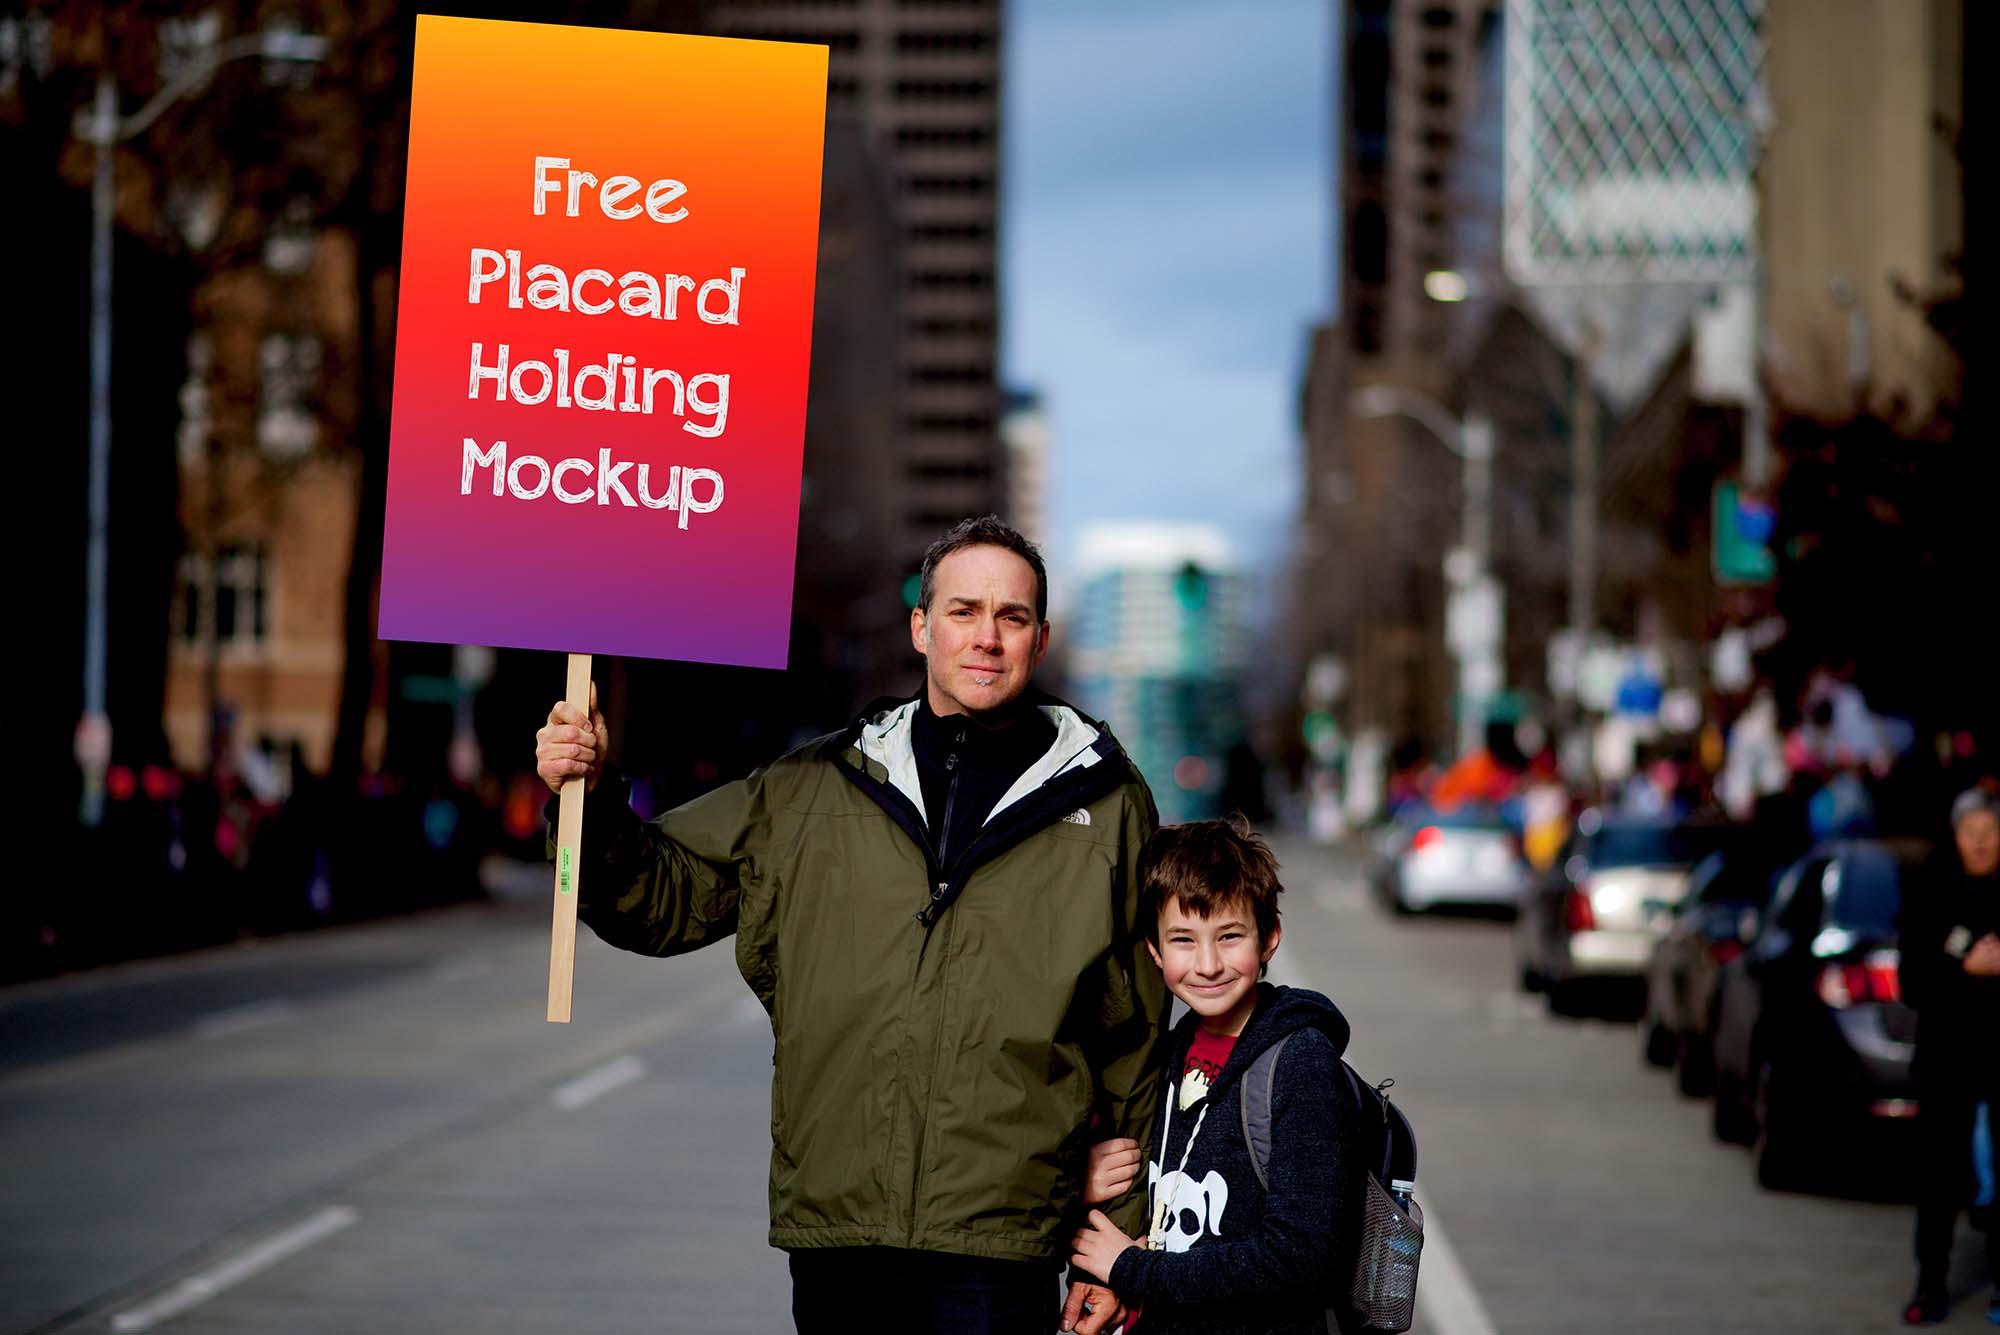 Placard Holding Mockup